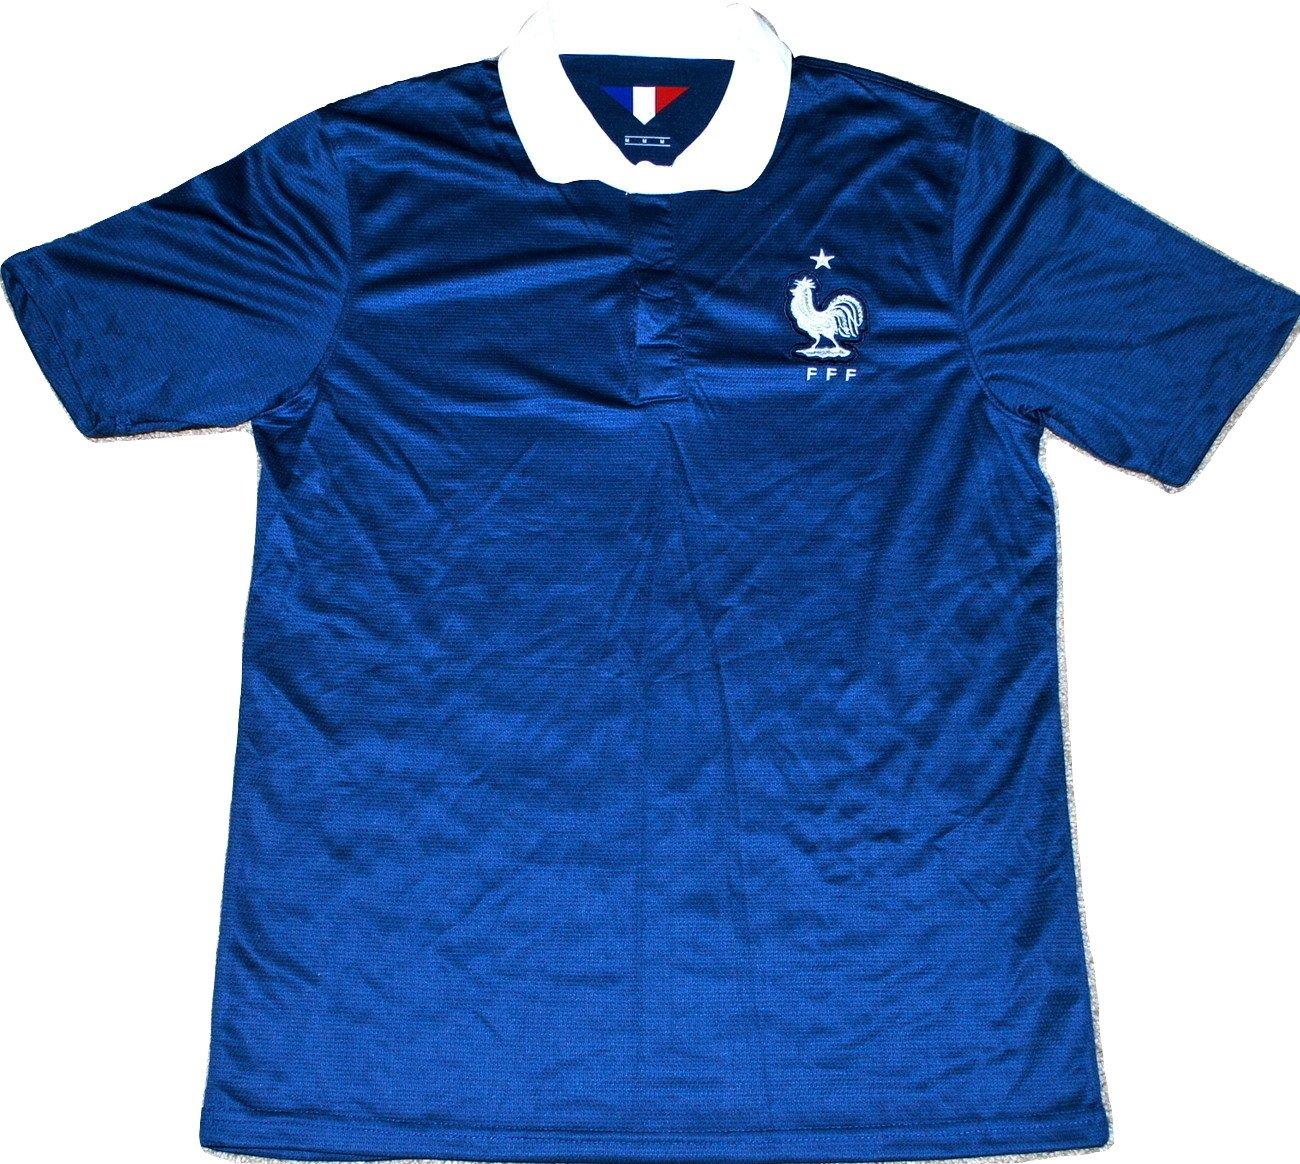 France National足ボールサッカー( Futbol )ジャージーシャツ B00M1KWWMQ